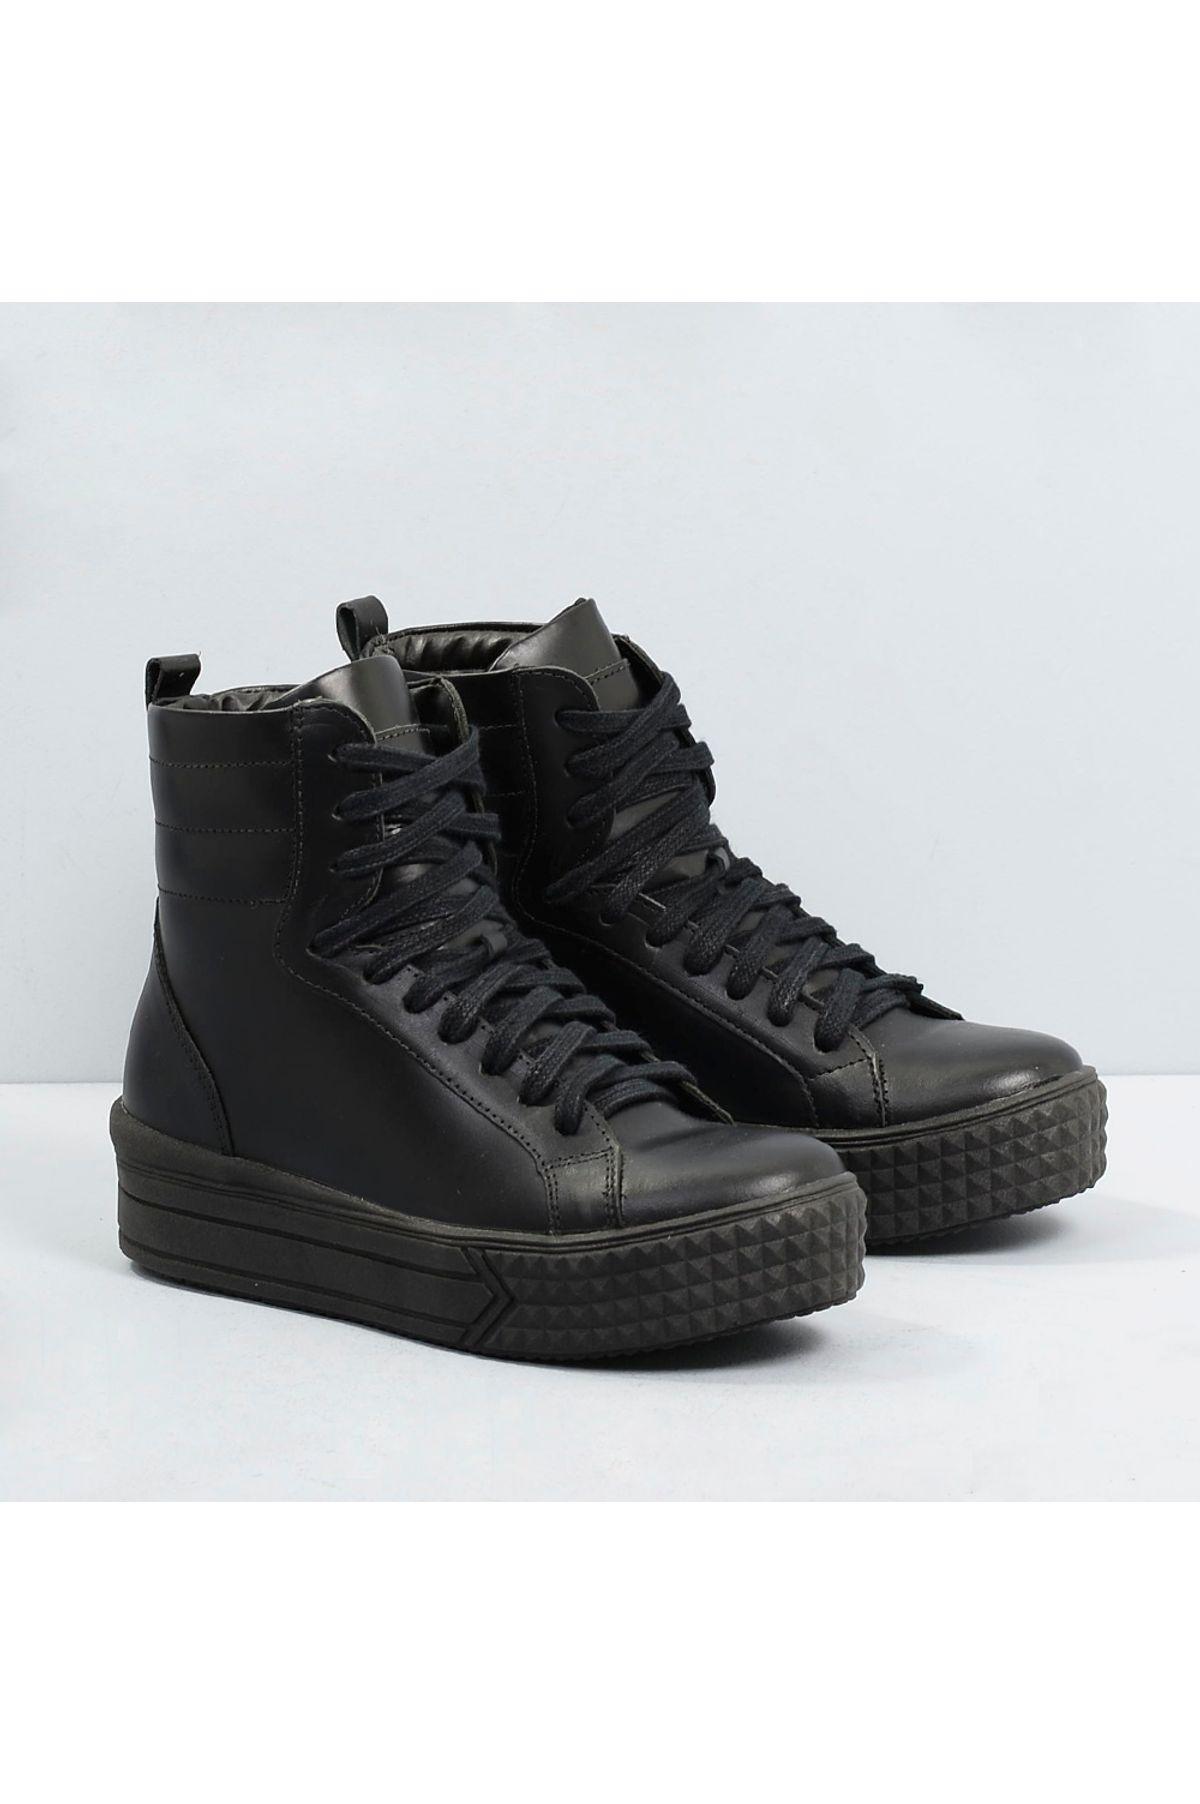 5ae72ecf8 Bota Hardcore Footwear Classic